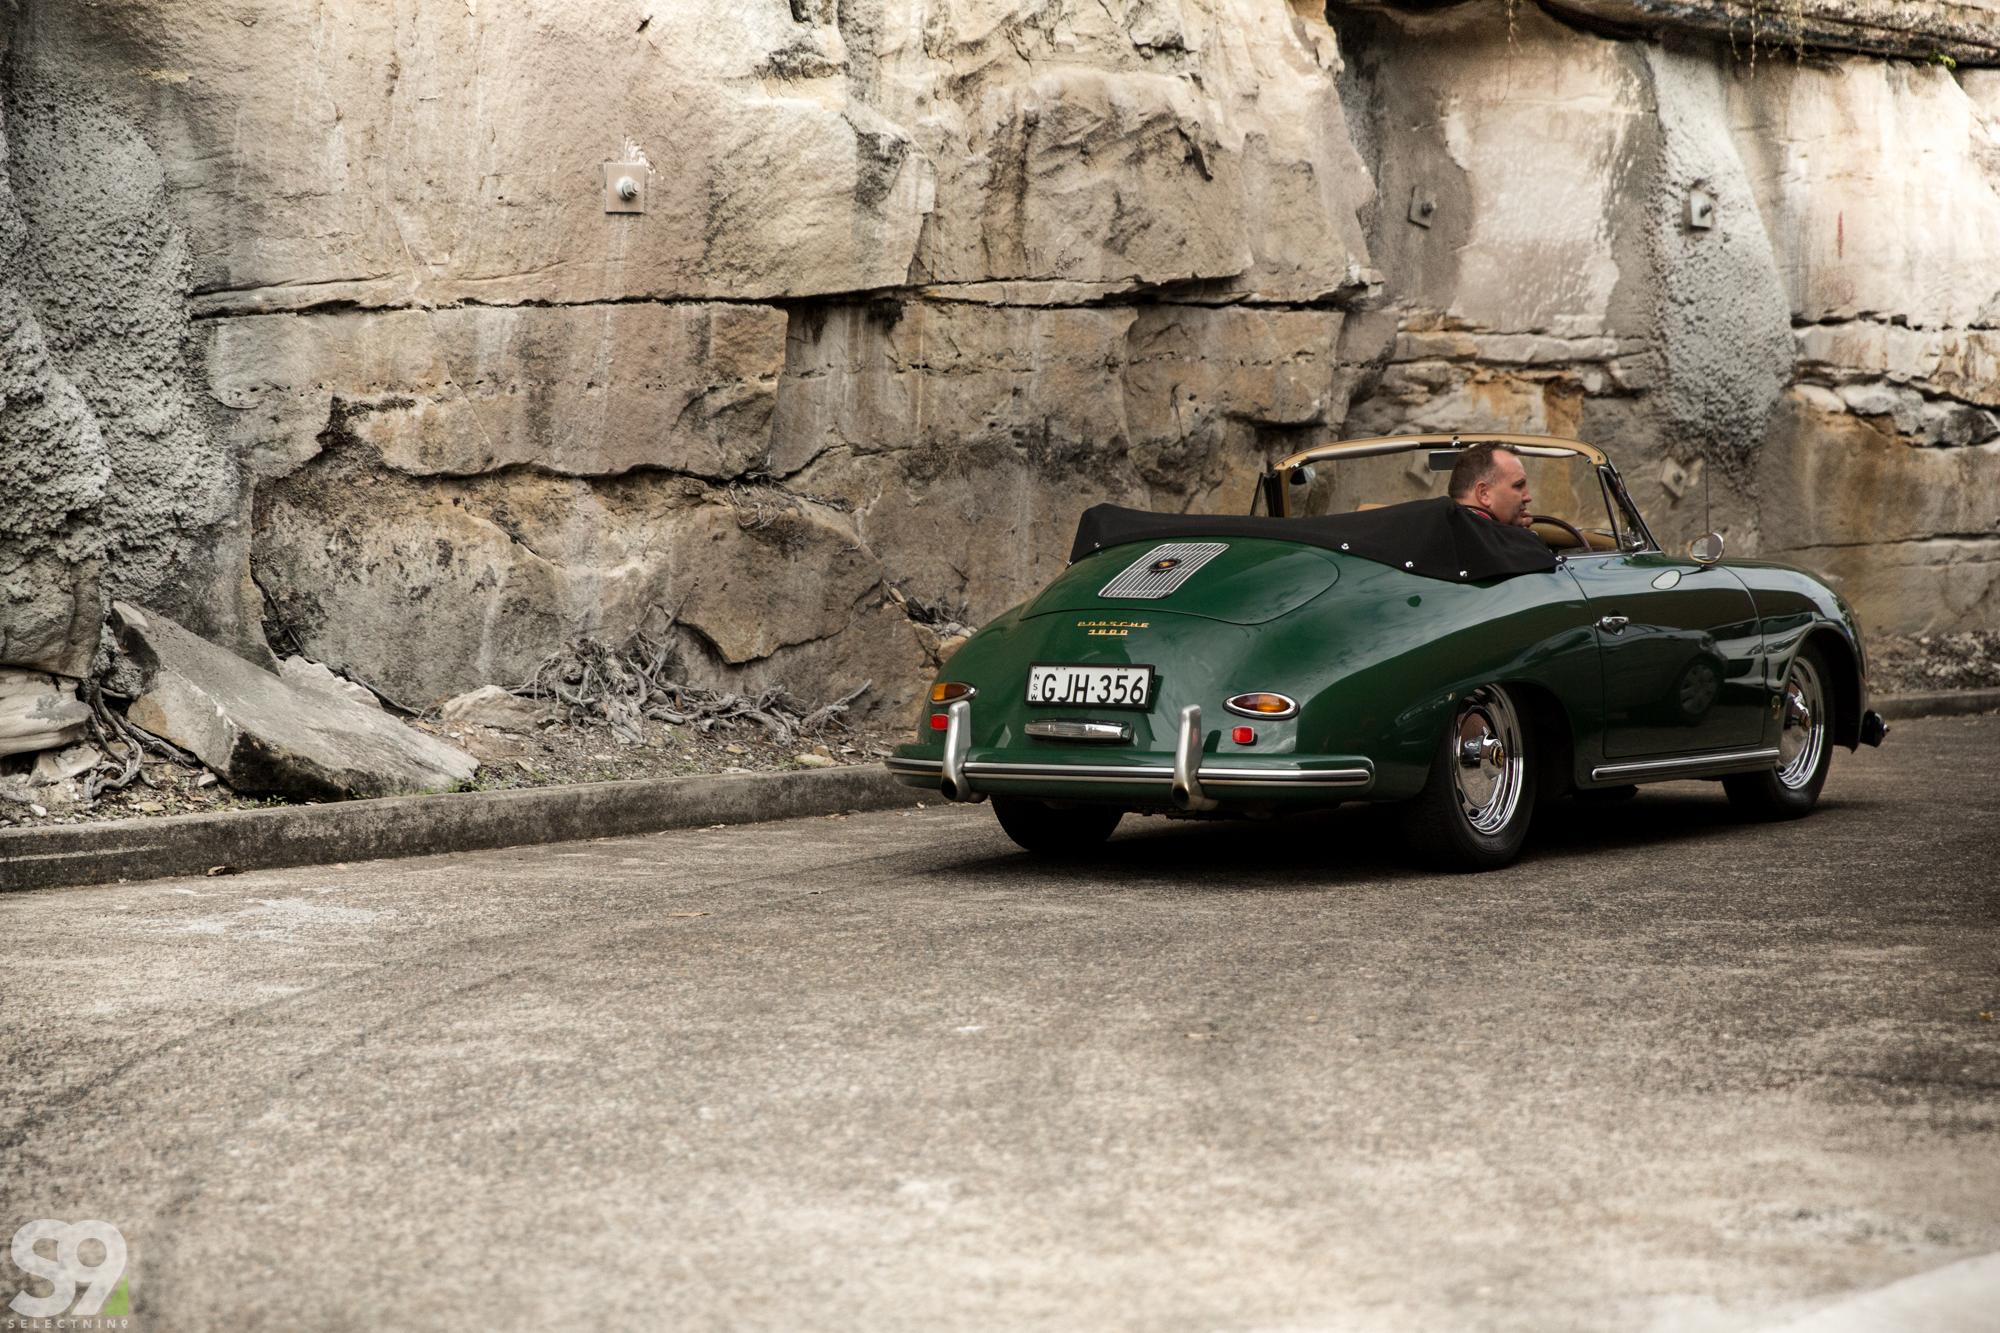 Auto Garage For Sale Hamilton: Autohaus Hamilton Porsche 356